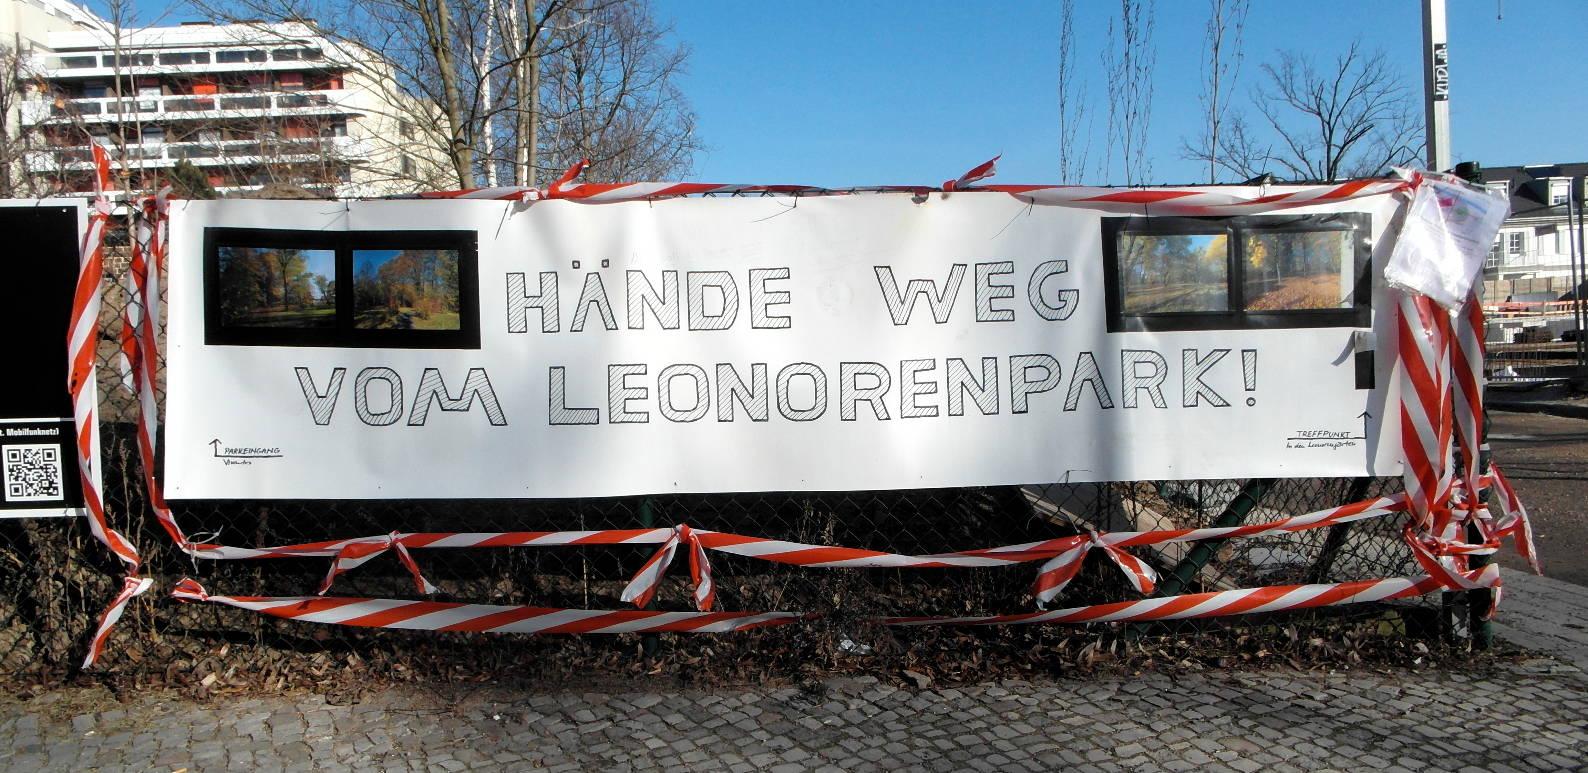 eonorenpark — Protestbanner gegen Abholzung